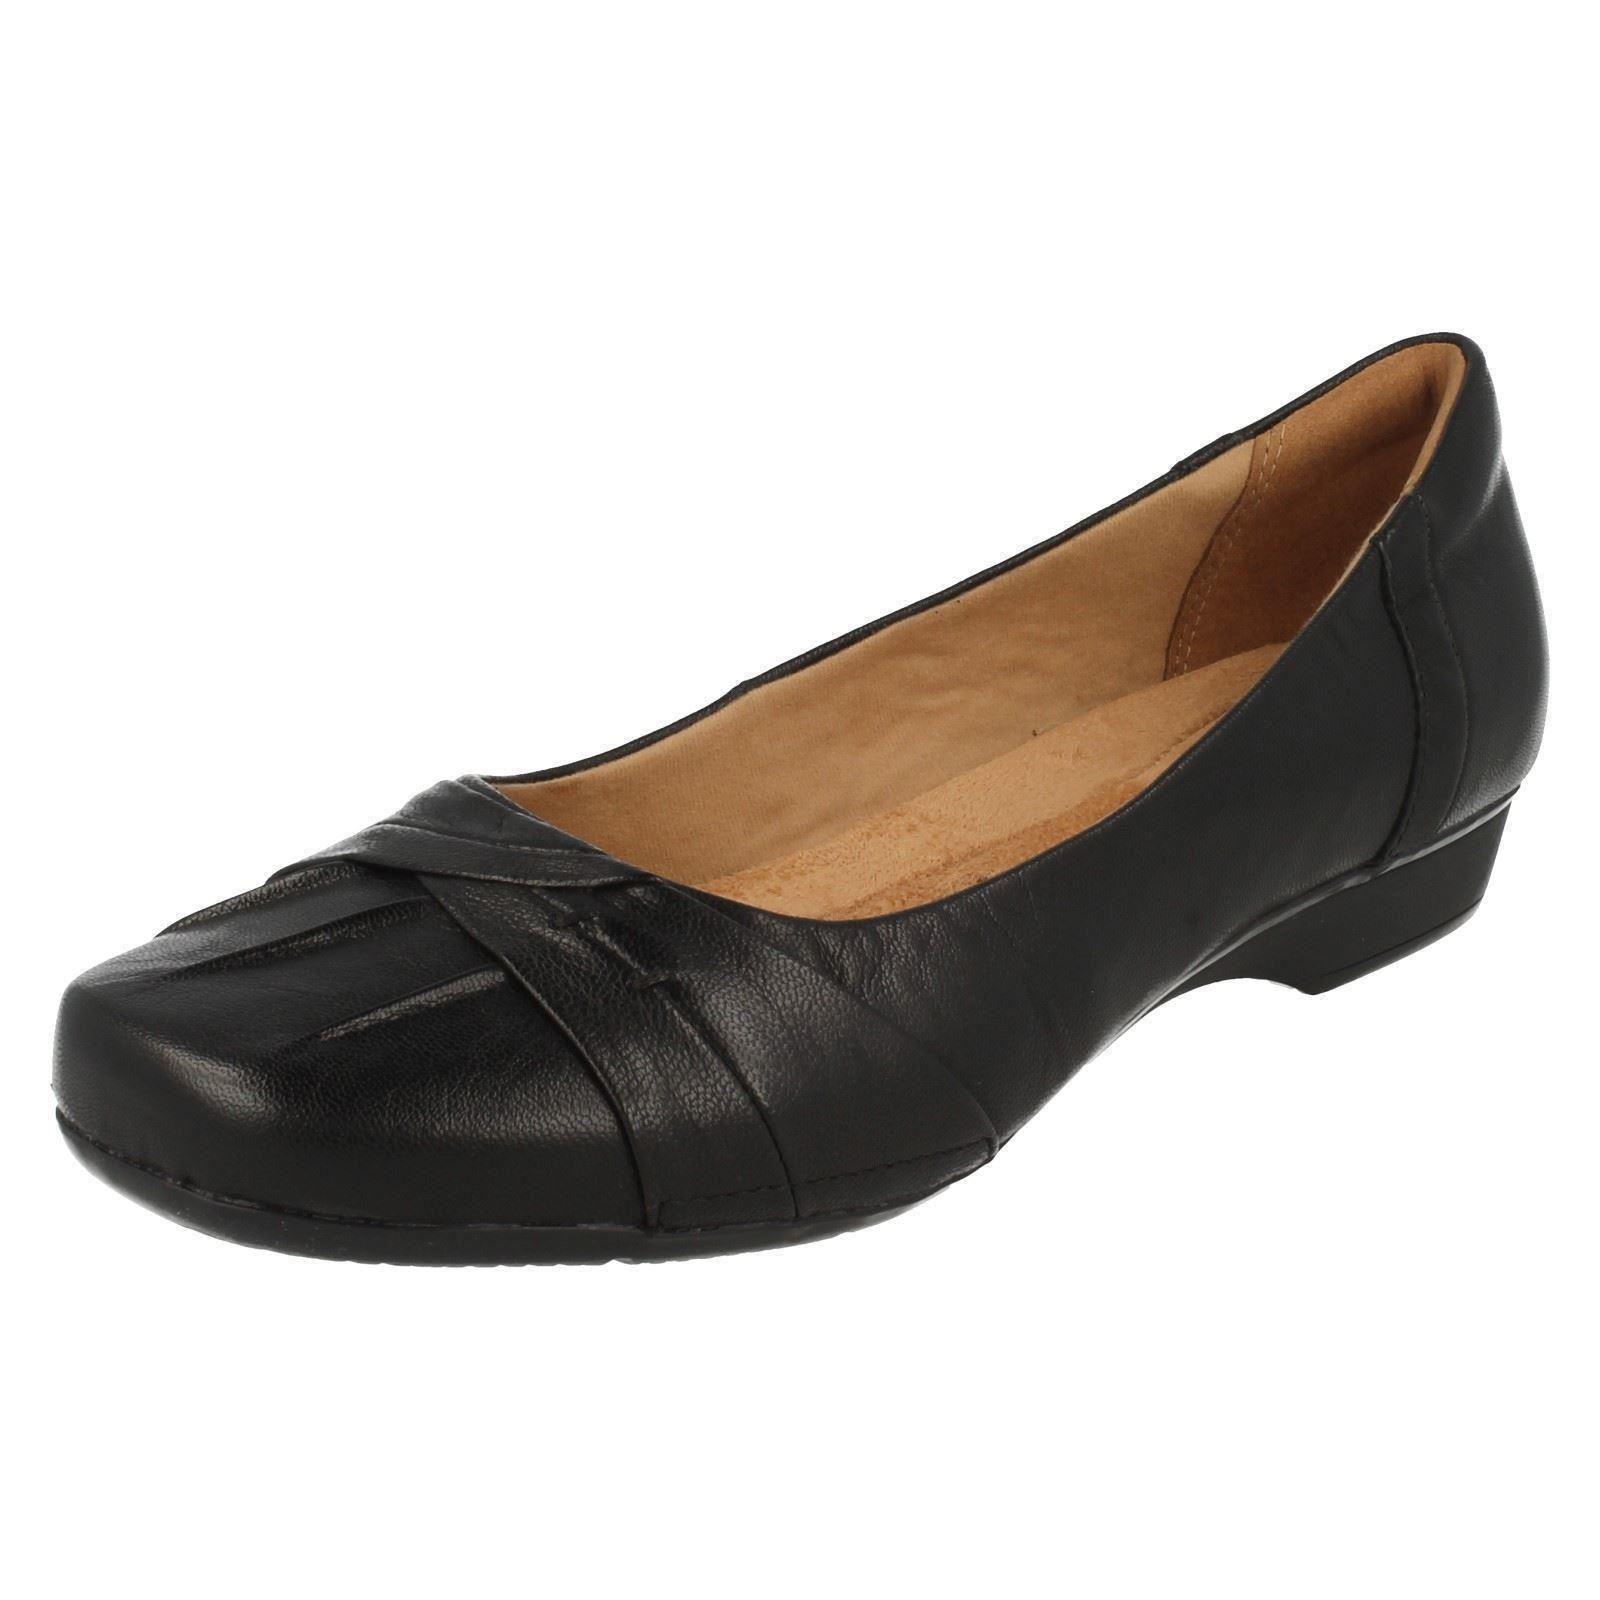 Clarks Ladies Black Slip On Shoes